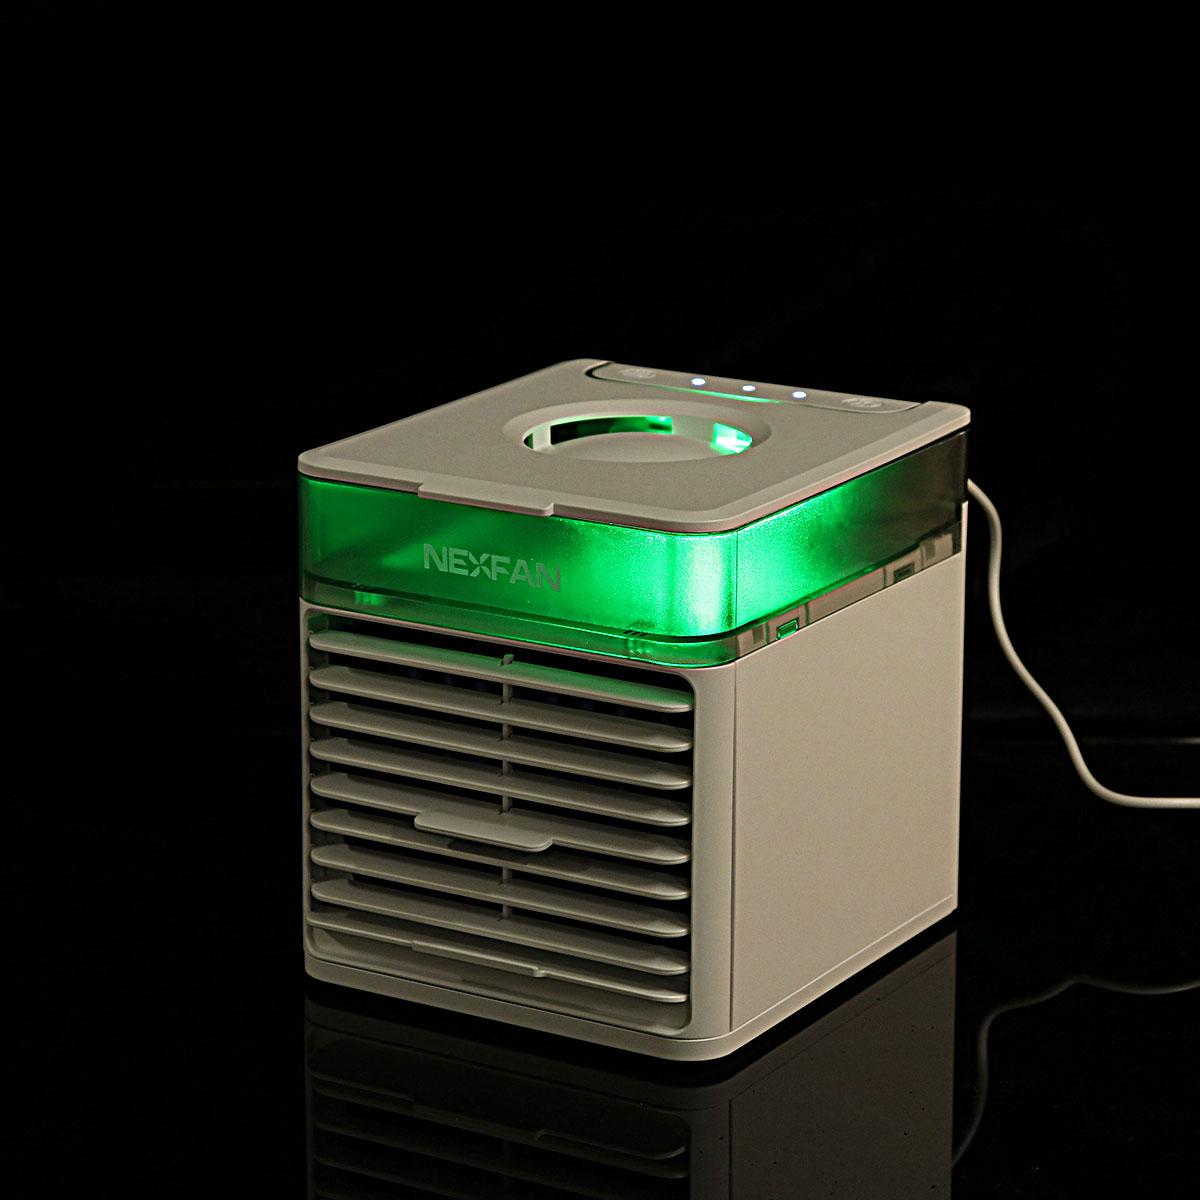 USB UVC Air Cooler Sprayer Night Light Portable Mini Air Conditioner Humidifier Sterilization Mist Fan Desktop Office